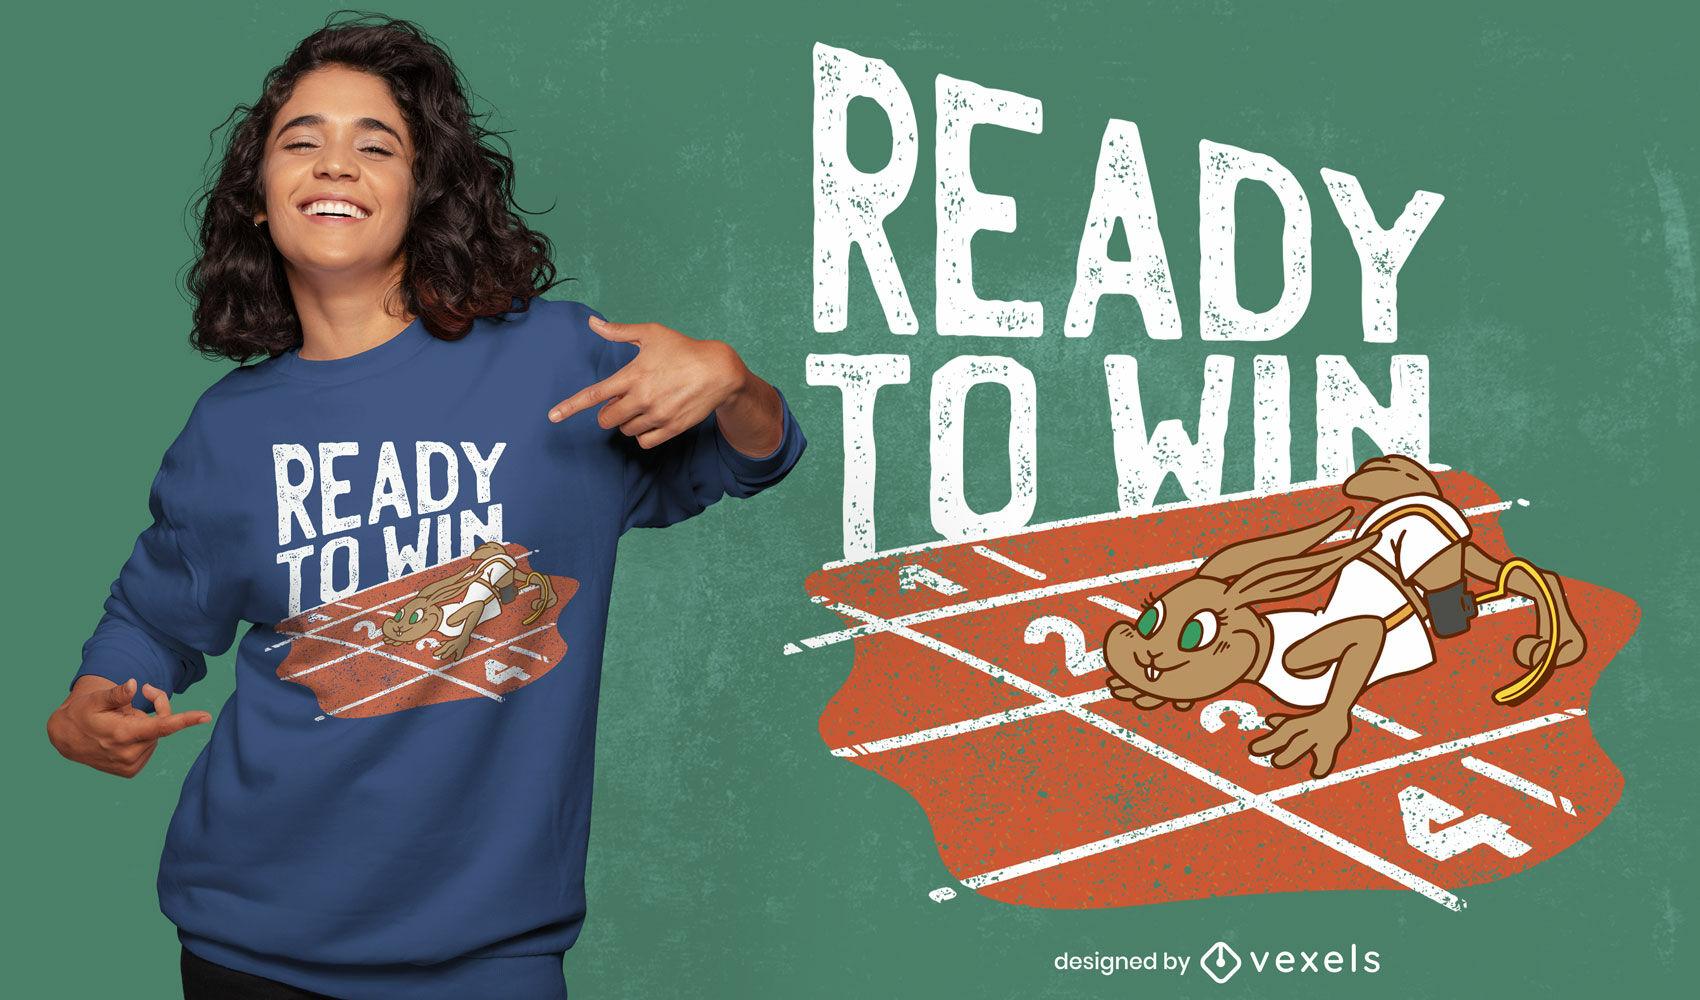 Win paralympic bunny t-shirt design